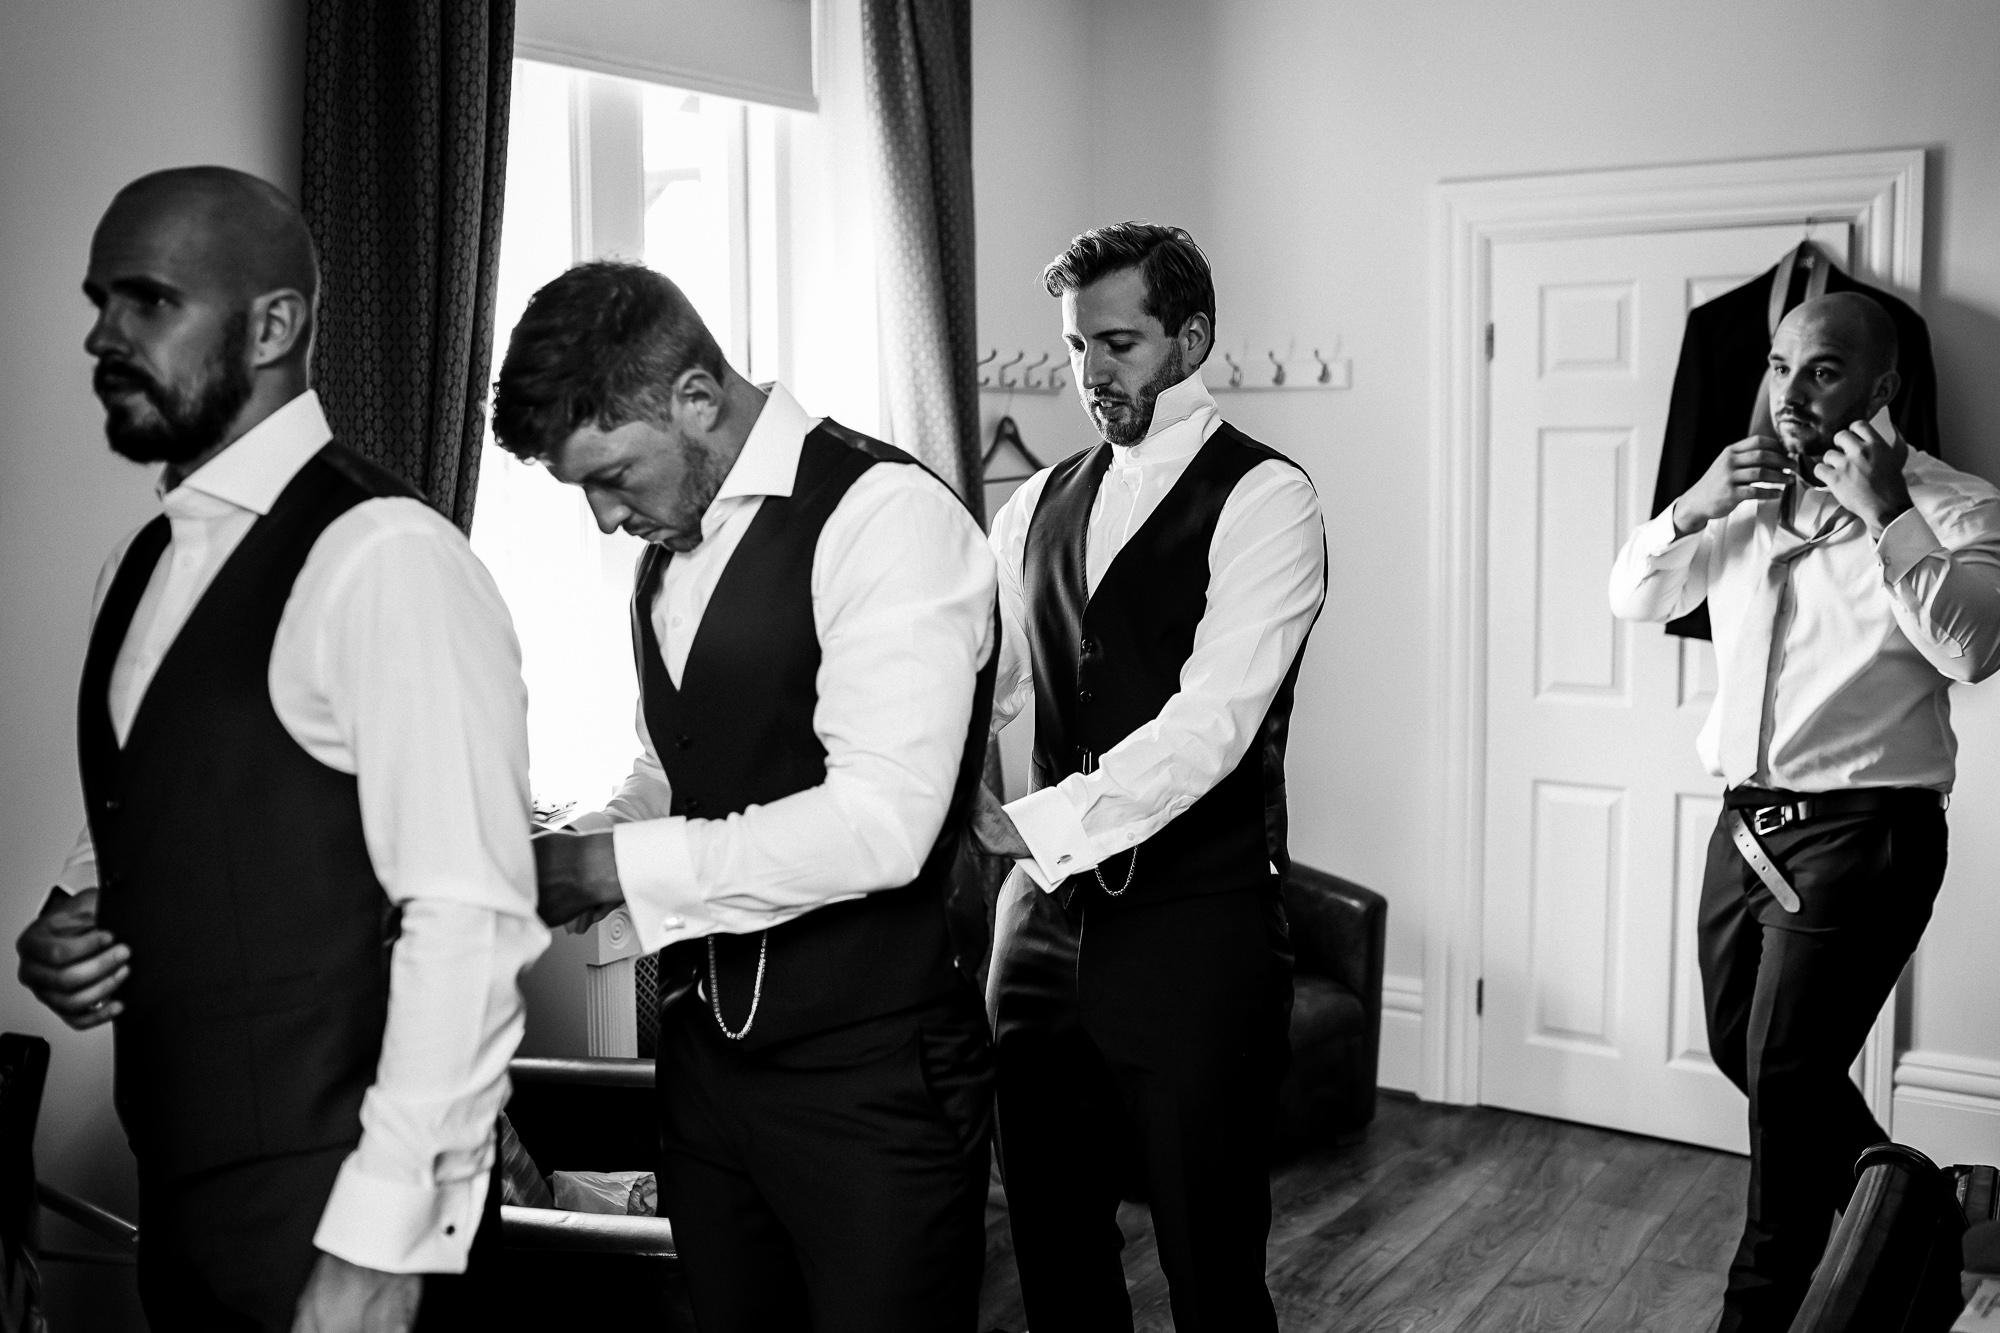 West Tower Wedding Photographer Ormskirk Lancashire wedding photography (2 of 3).jpg